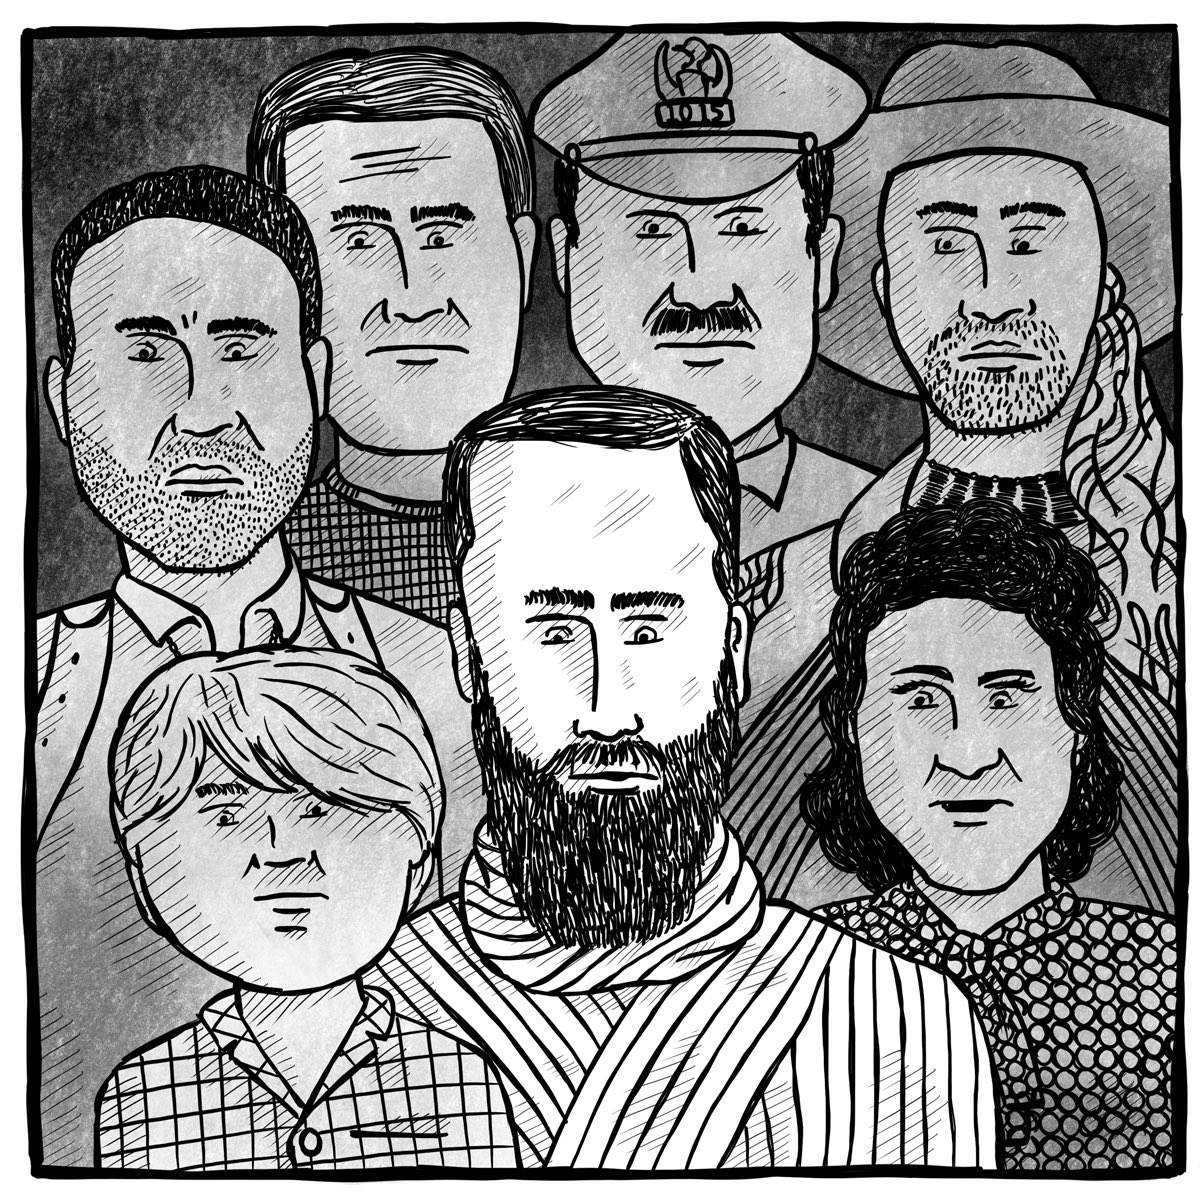 The Twilight Zone 2020. The Who Of You.   . #thetwilightzone #twilightzonemarathon #illustration #popcultureart #fanart #art #lineart #drawing #linedrawing #sciencefiction #rodserling @CBS @cbsinteractive @JordanPeele @EmbryEthan @theebillyporterpic.twitter.com/m3BOqnQ54U